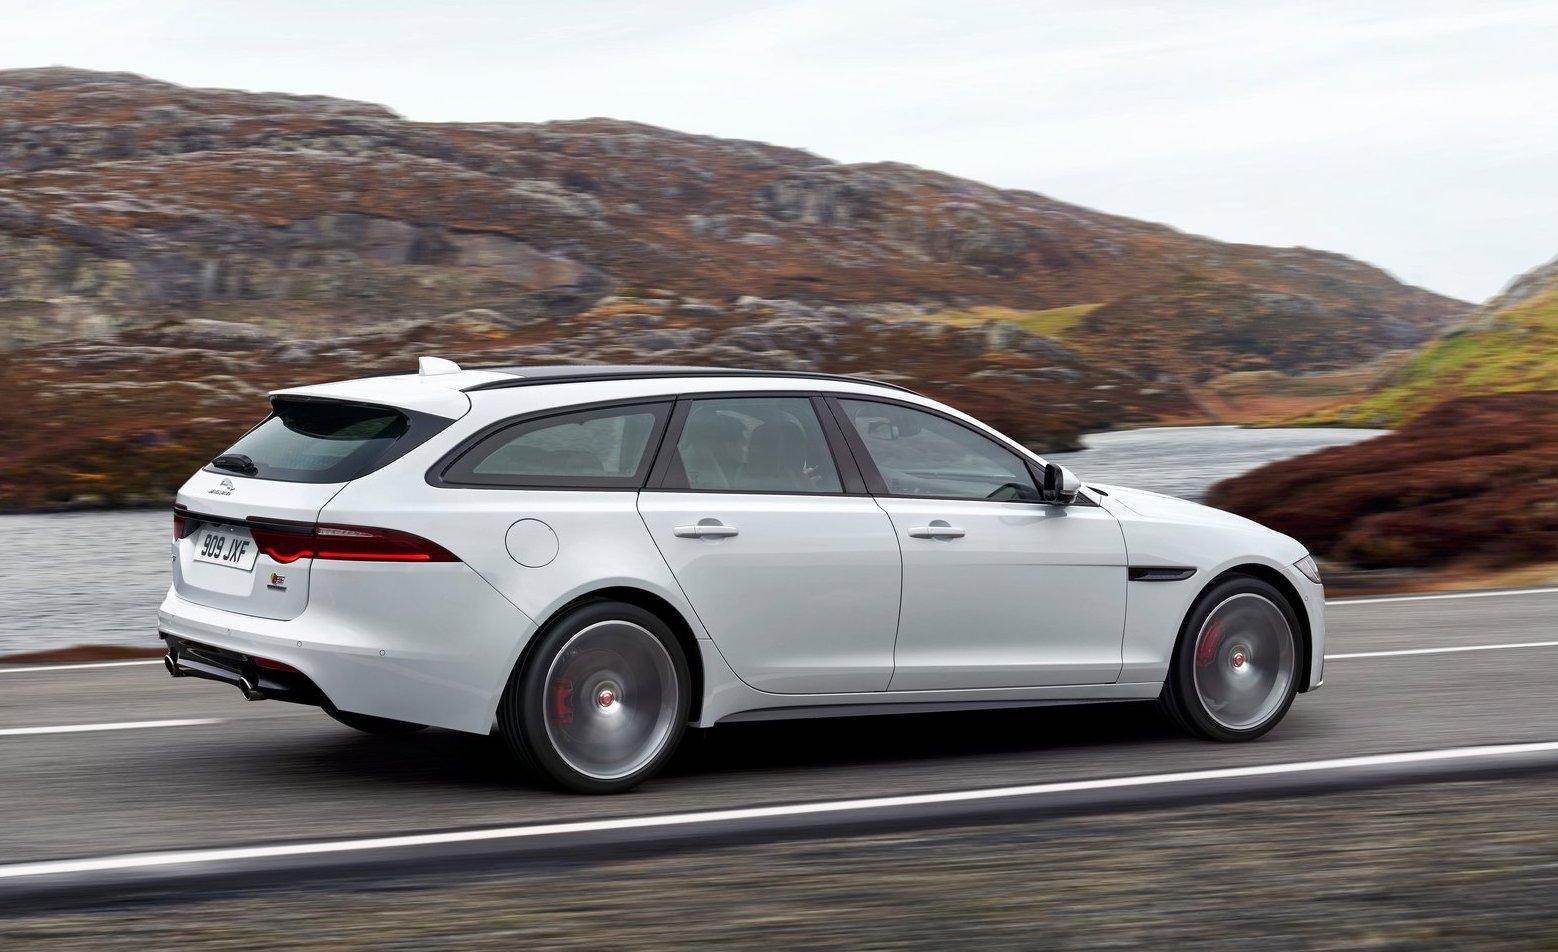 2018 Jaguar Xf Sportbrake Prices Announced For Australia